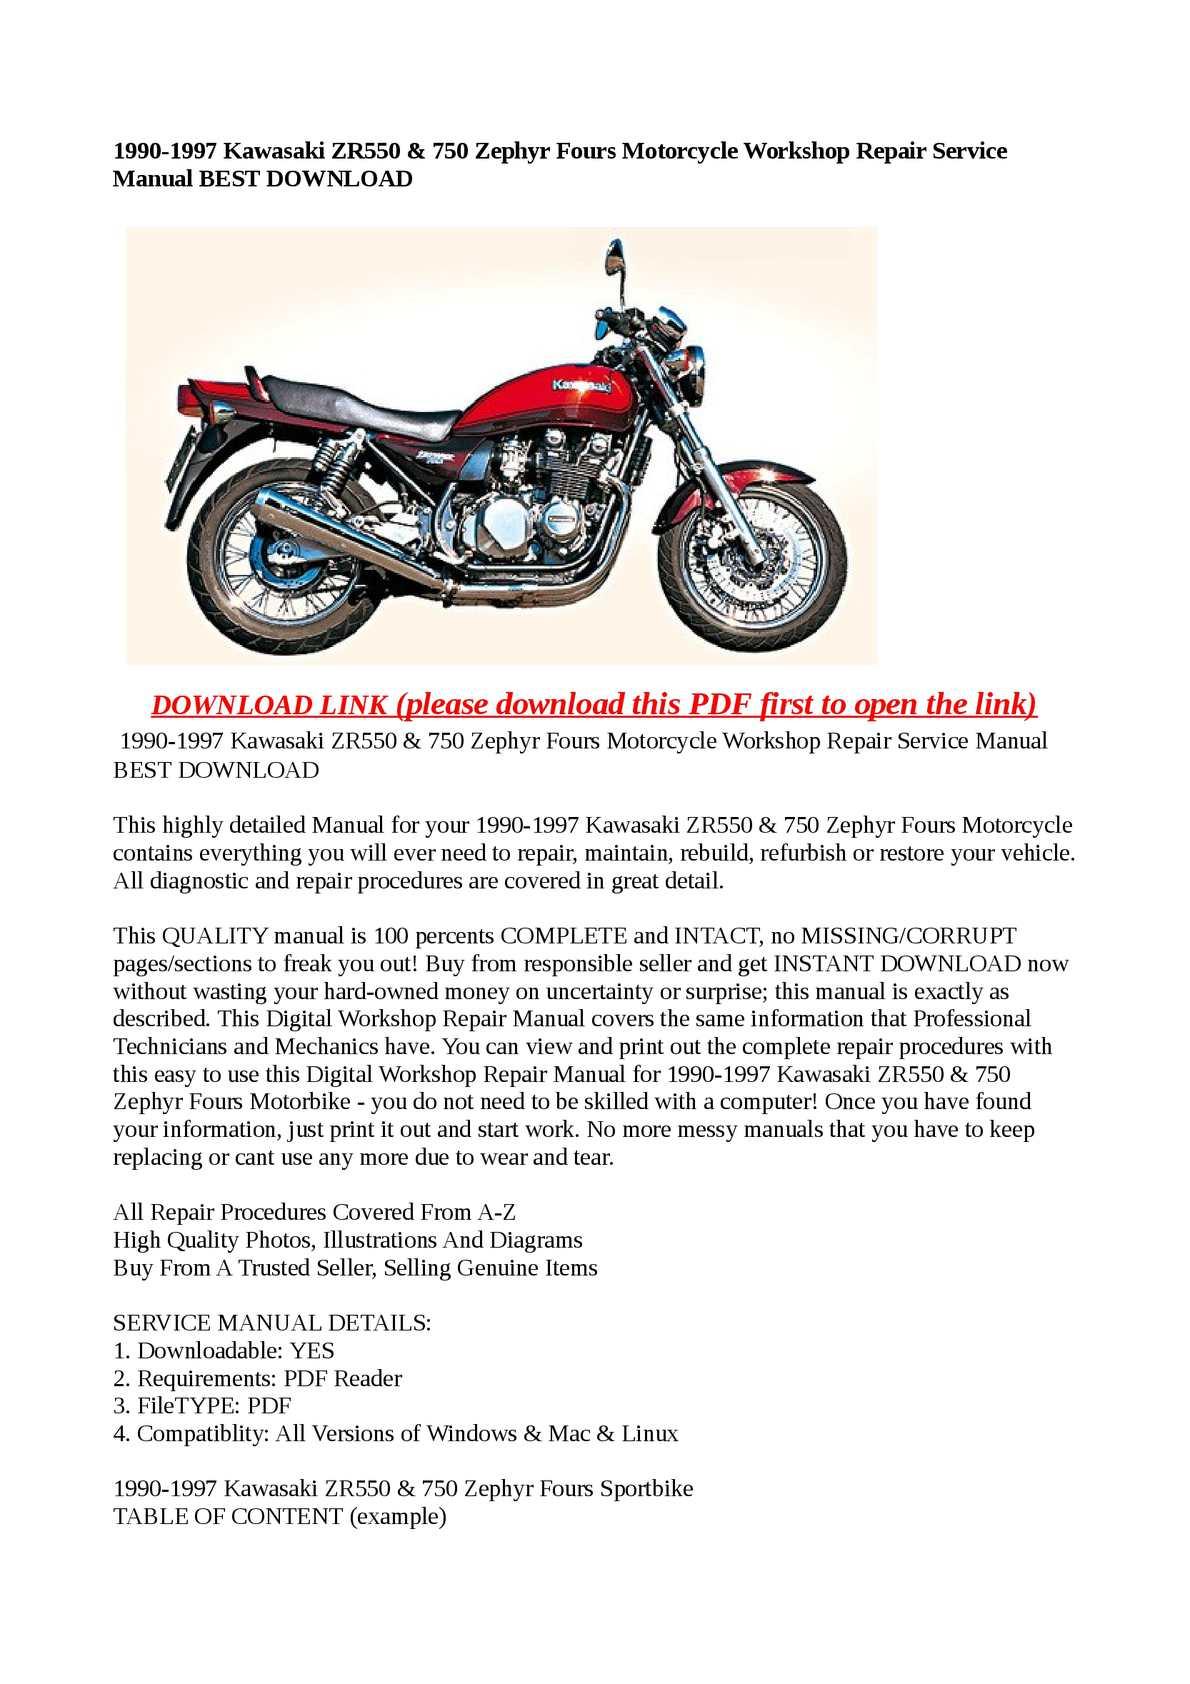 Calaméo - 1990-1997 Kawasaki ZR550 & 750 Zephyr Fours Motorcycle Workshop  Repair Service Manual BEST DOWNLOAD